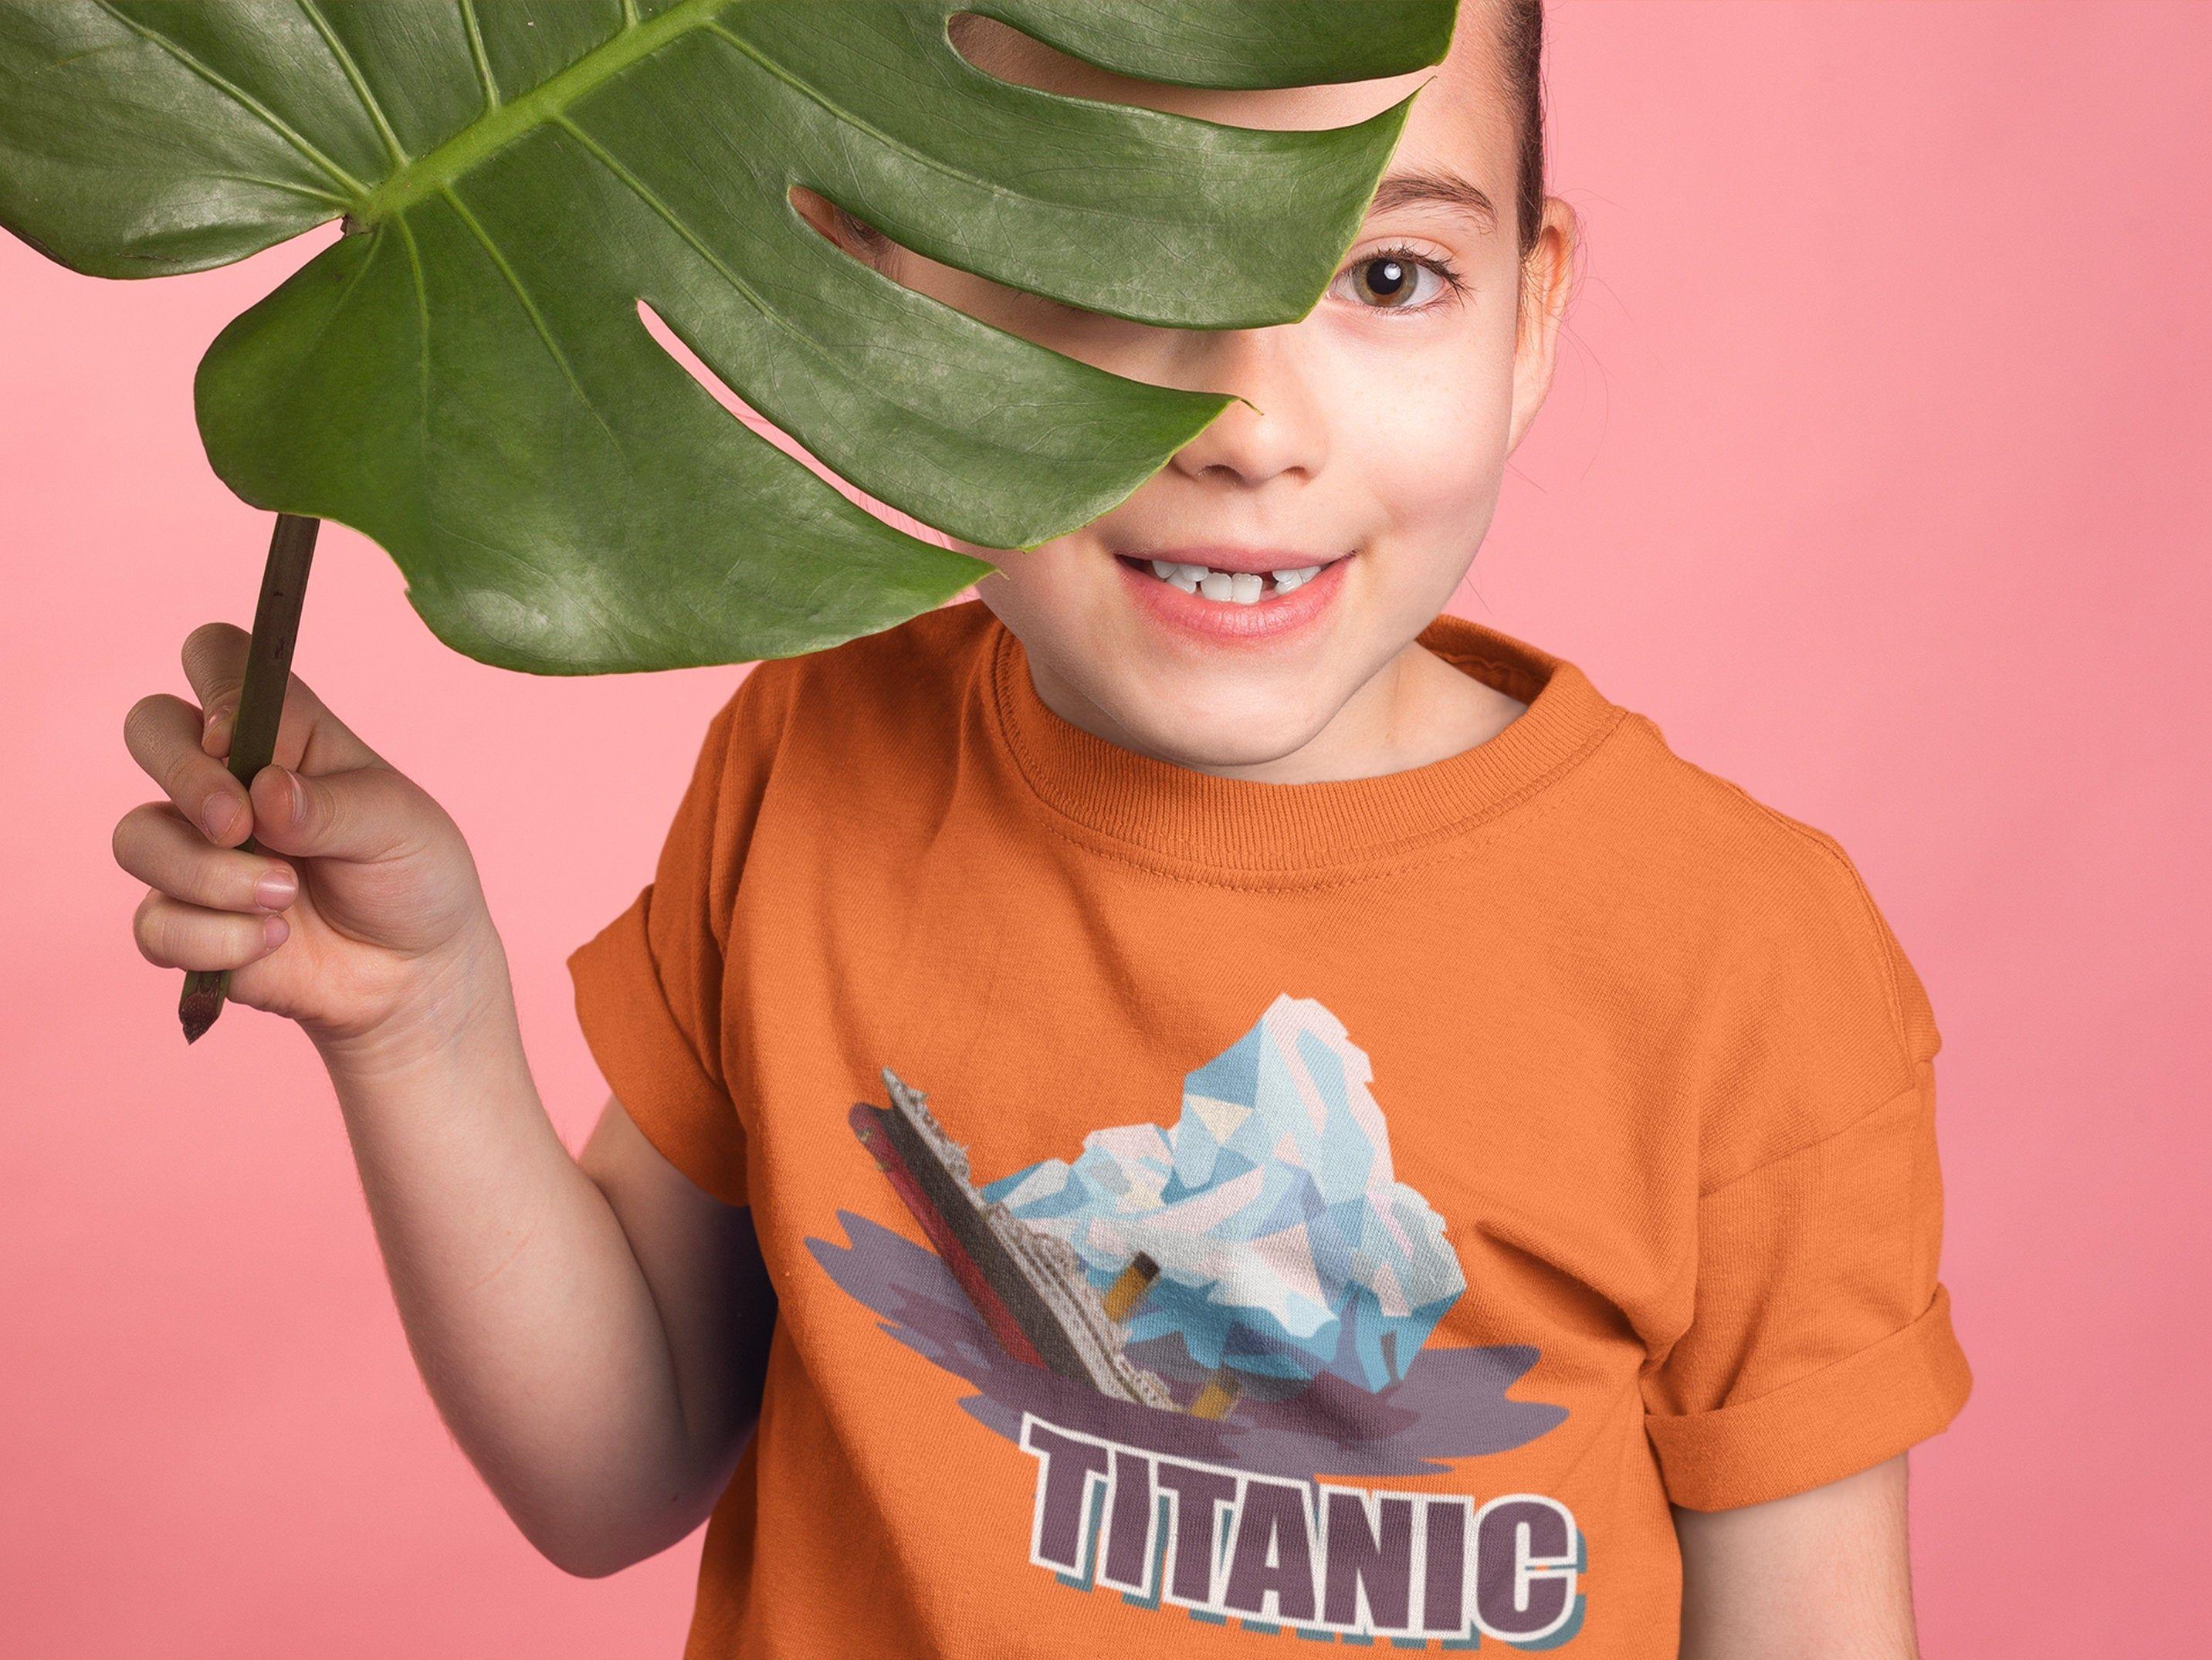 Titanic Adventure T Shirt Summer Cruise T Shirt For Boy 6 7 Etsy Summer Cruise Outfits Summer Cruises Cruise Tshirts